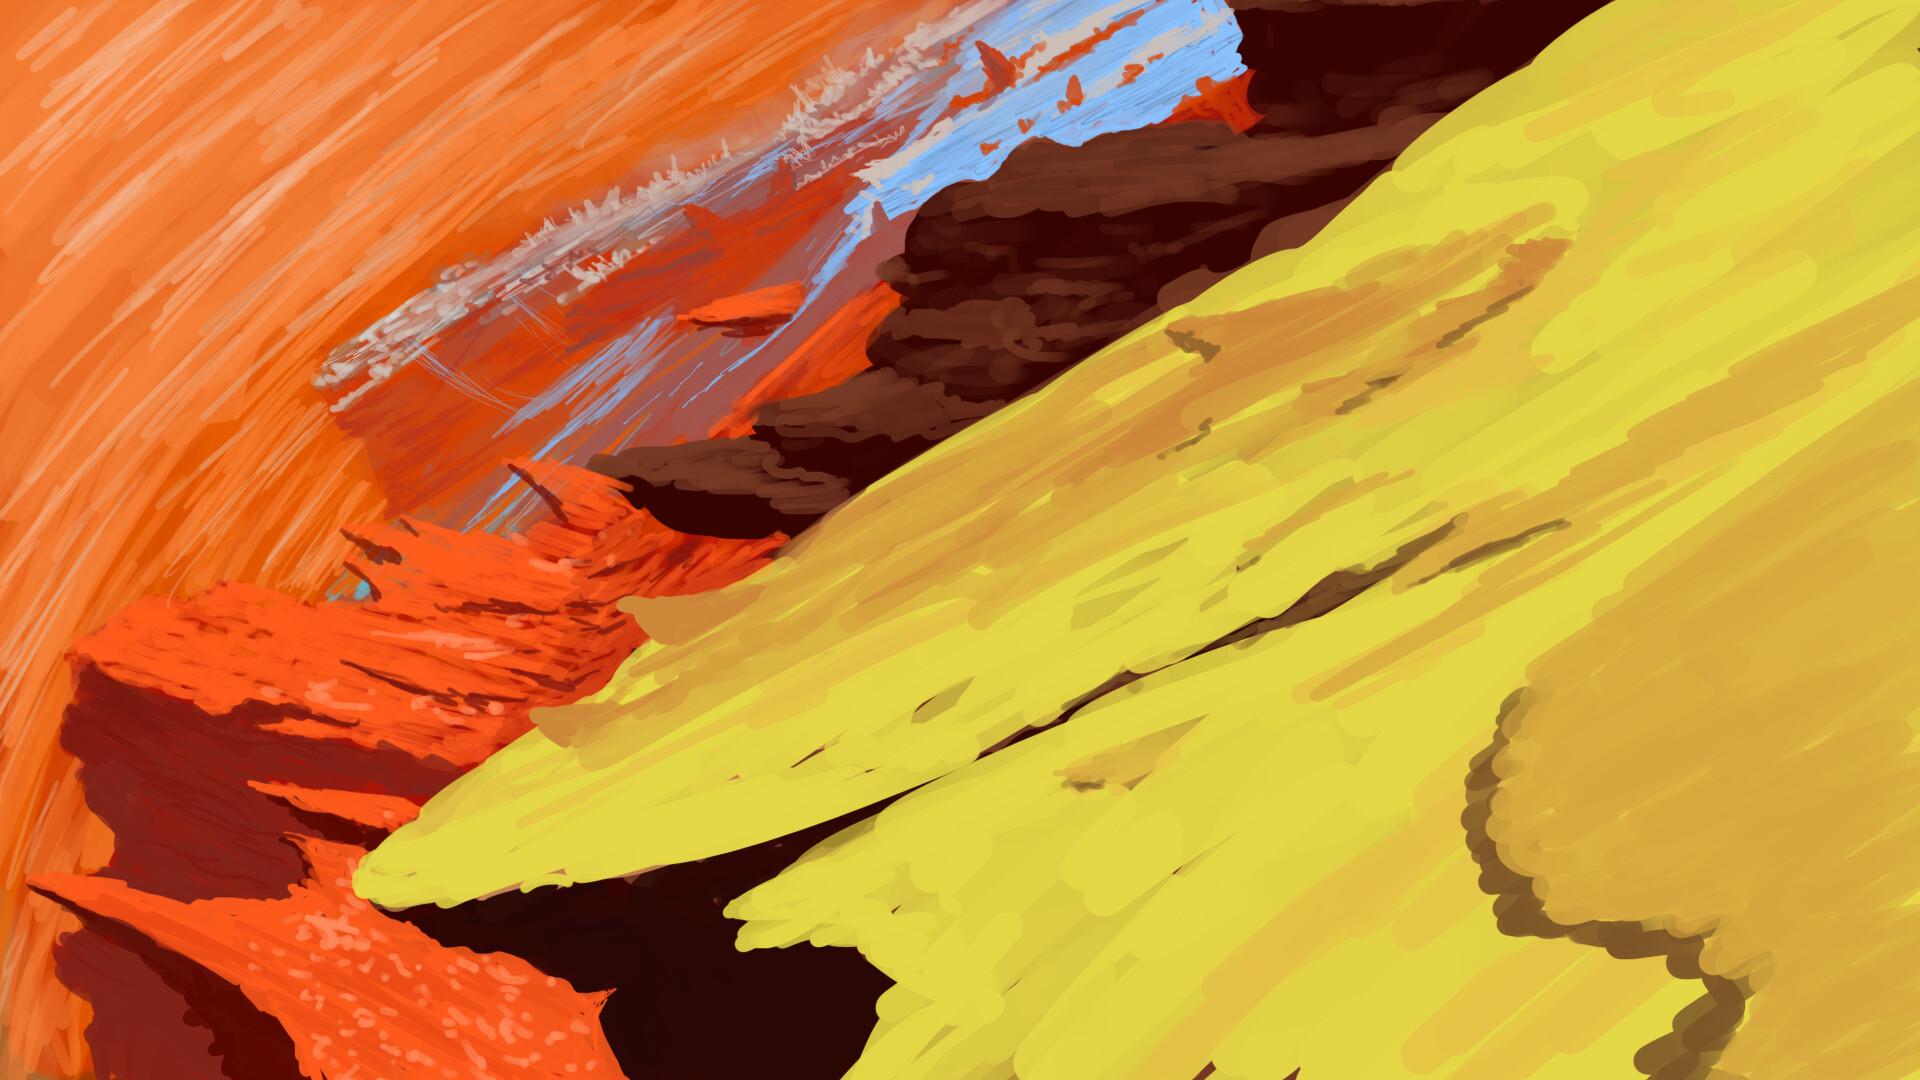 Alexander laheij environment desert sideways